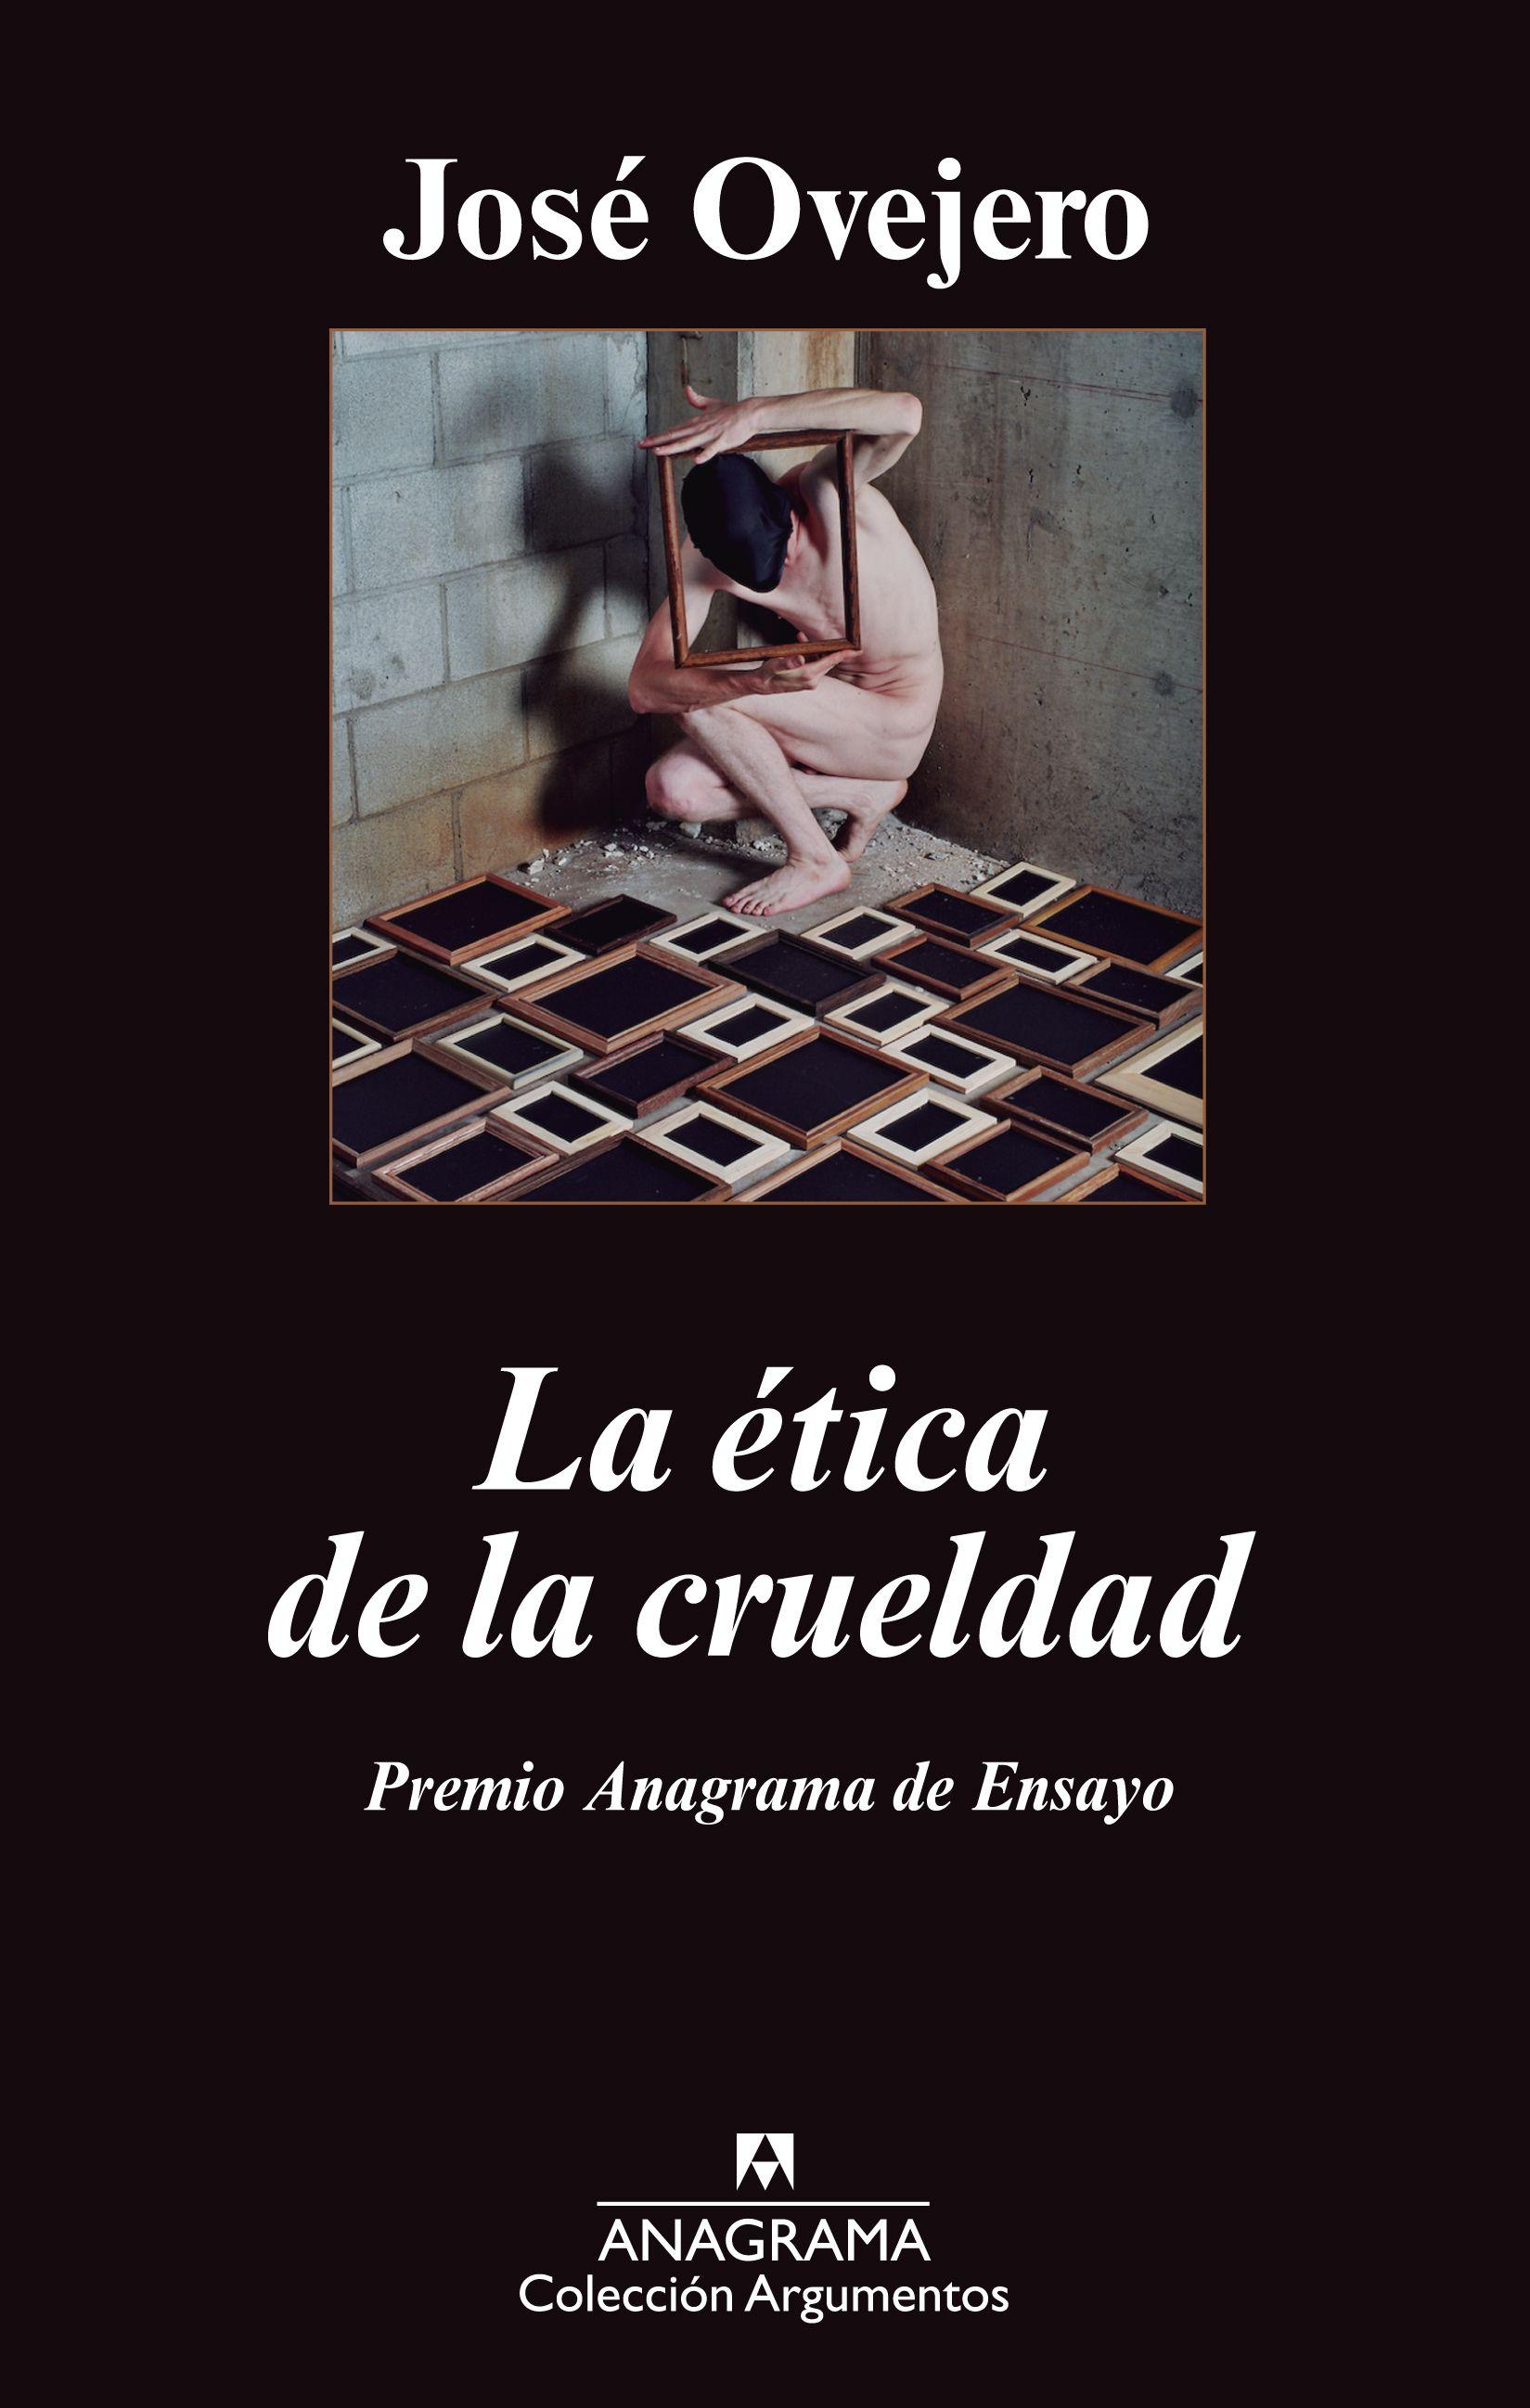 La ética de la crueldad - Ovejero, José - 978-84-339-6341-3 ...